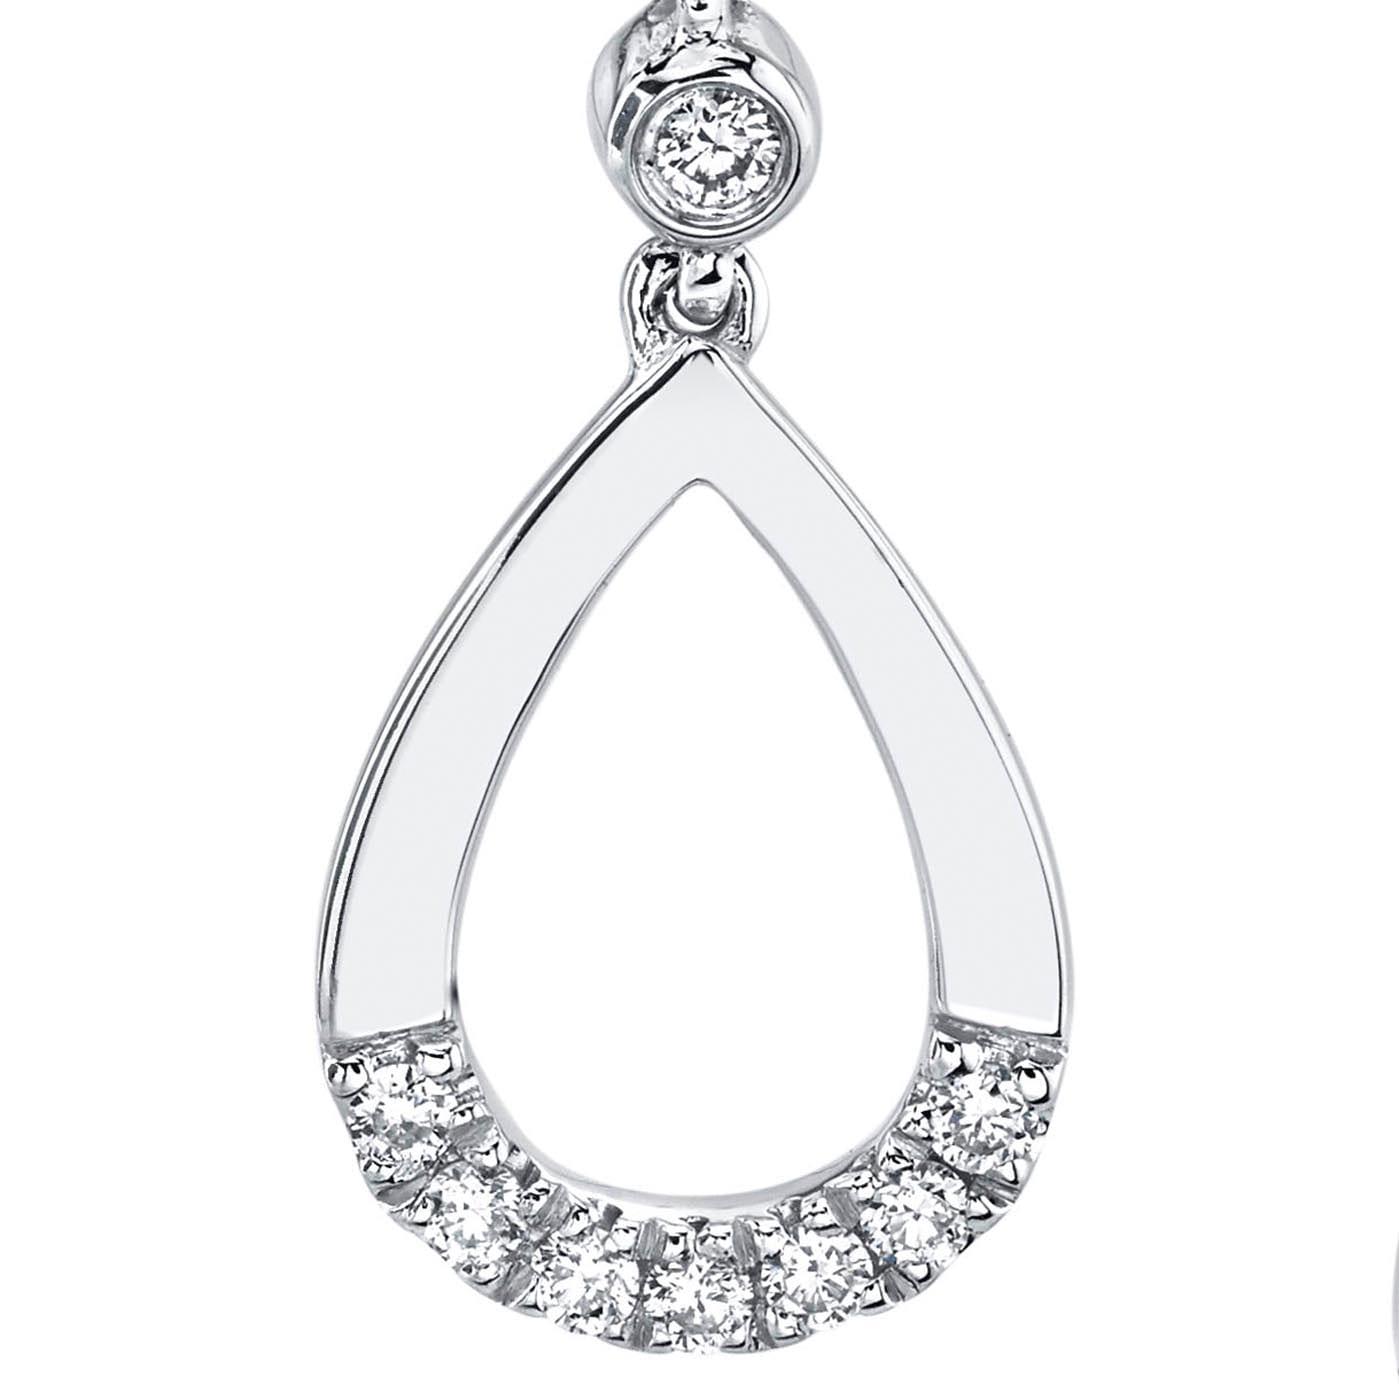 Diamond Earrings - Studs Style #: MARS-26872